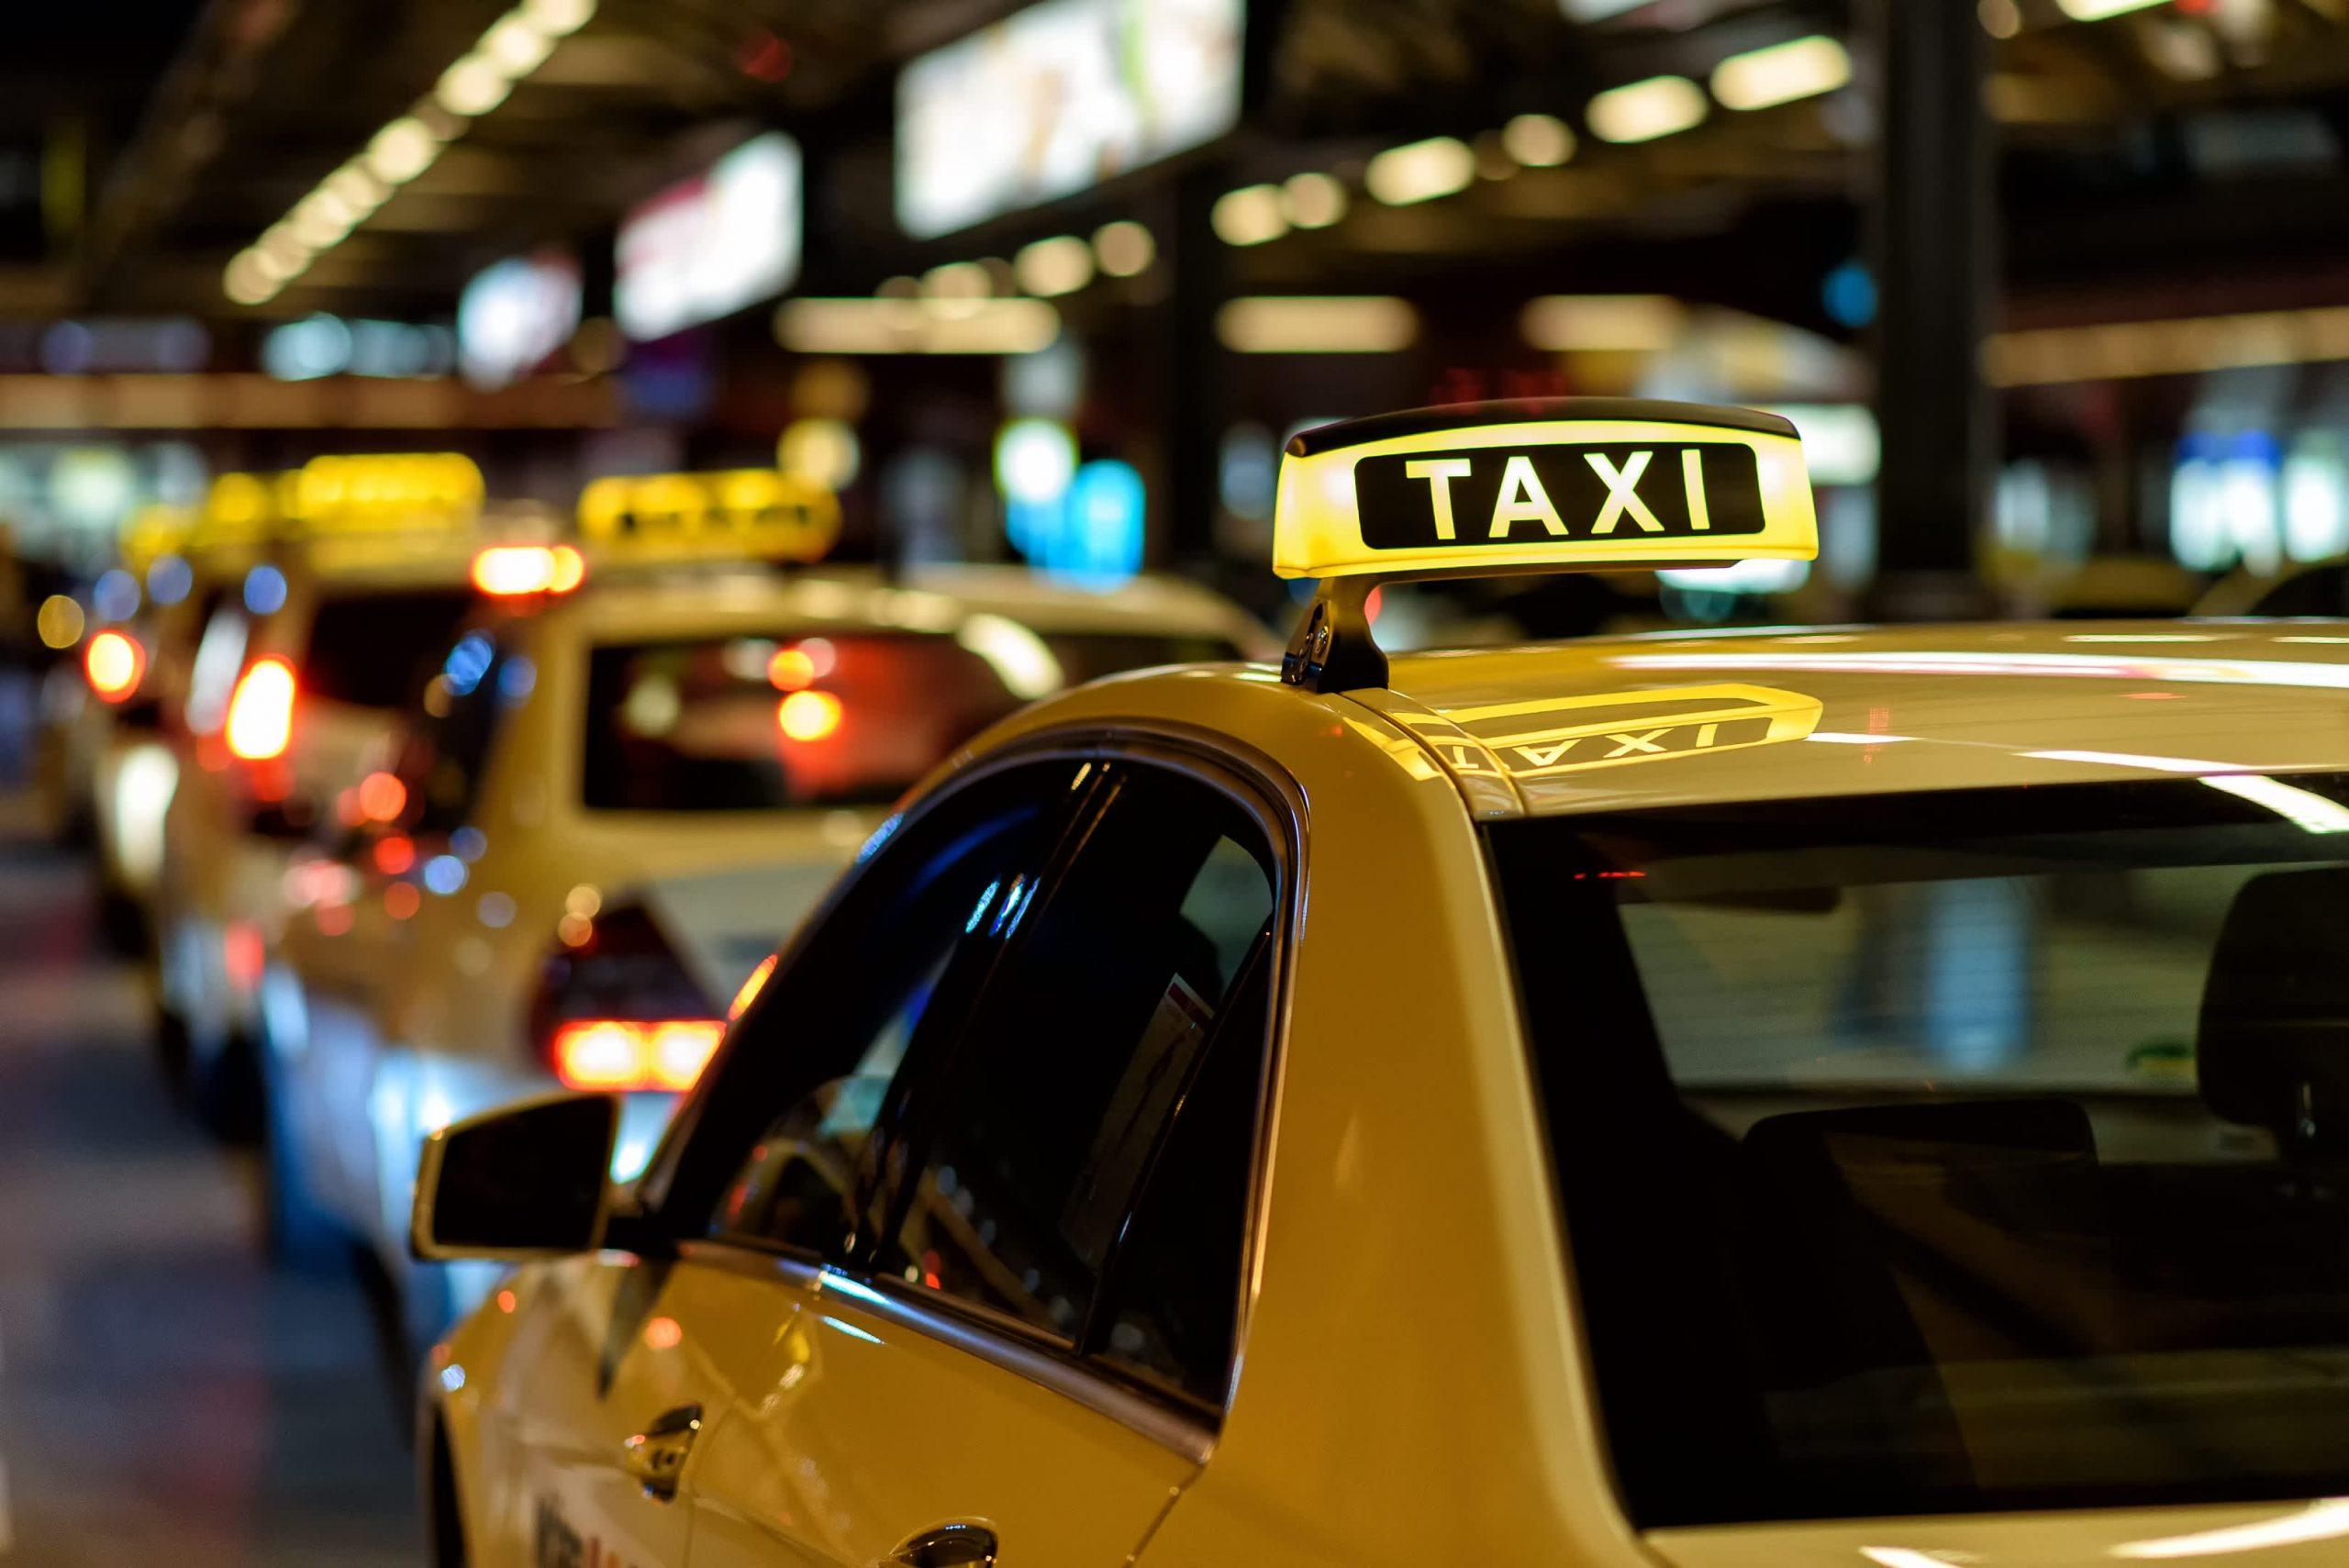 """За сколько докинешь? Дорого!"": ФАС проводит проверку цен на такси"